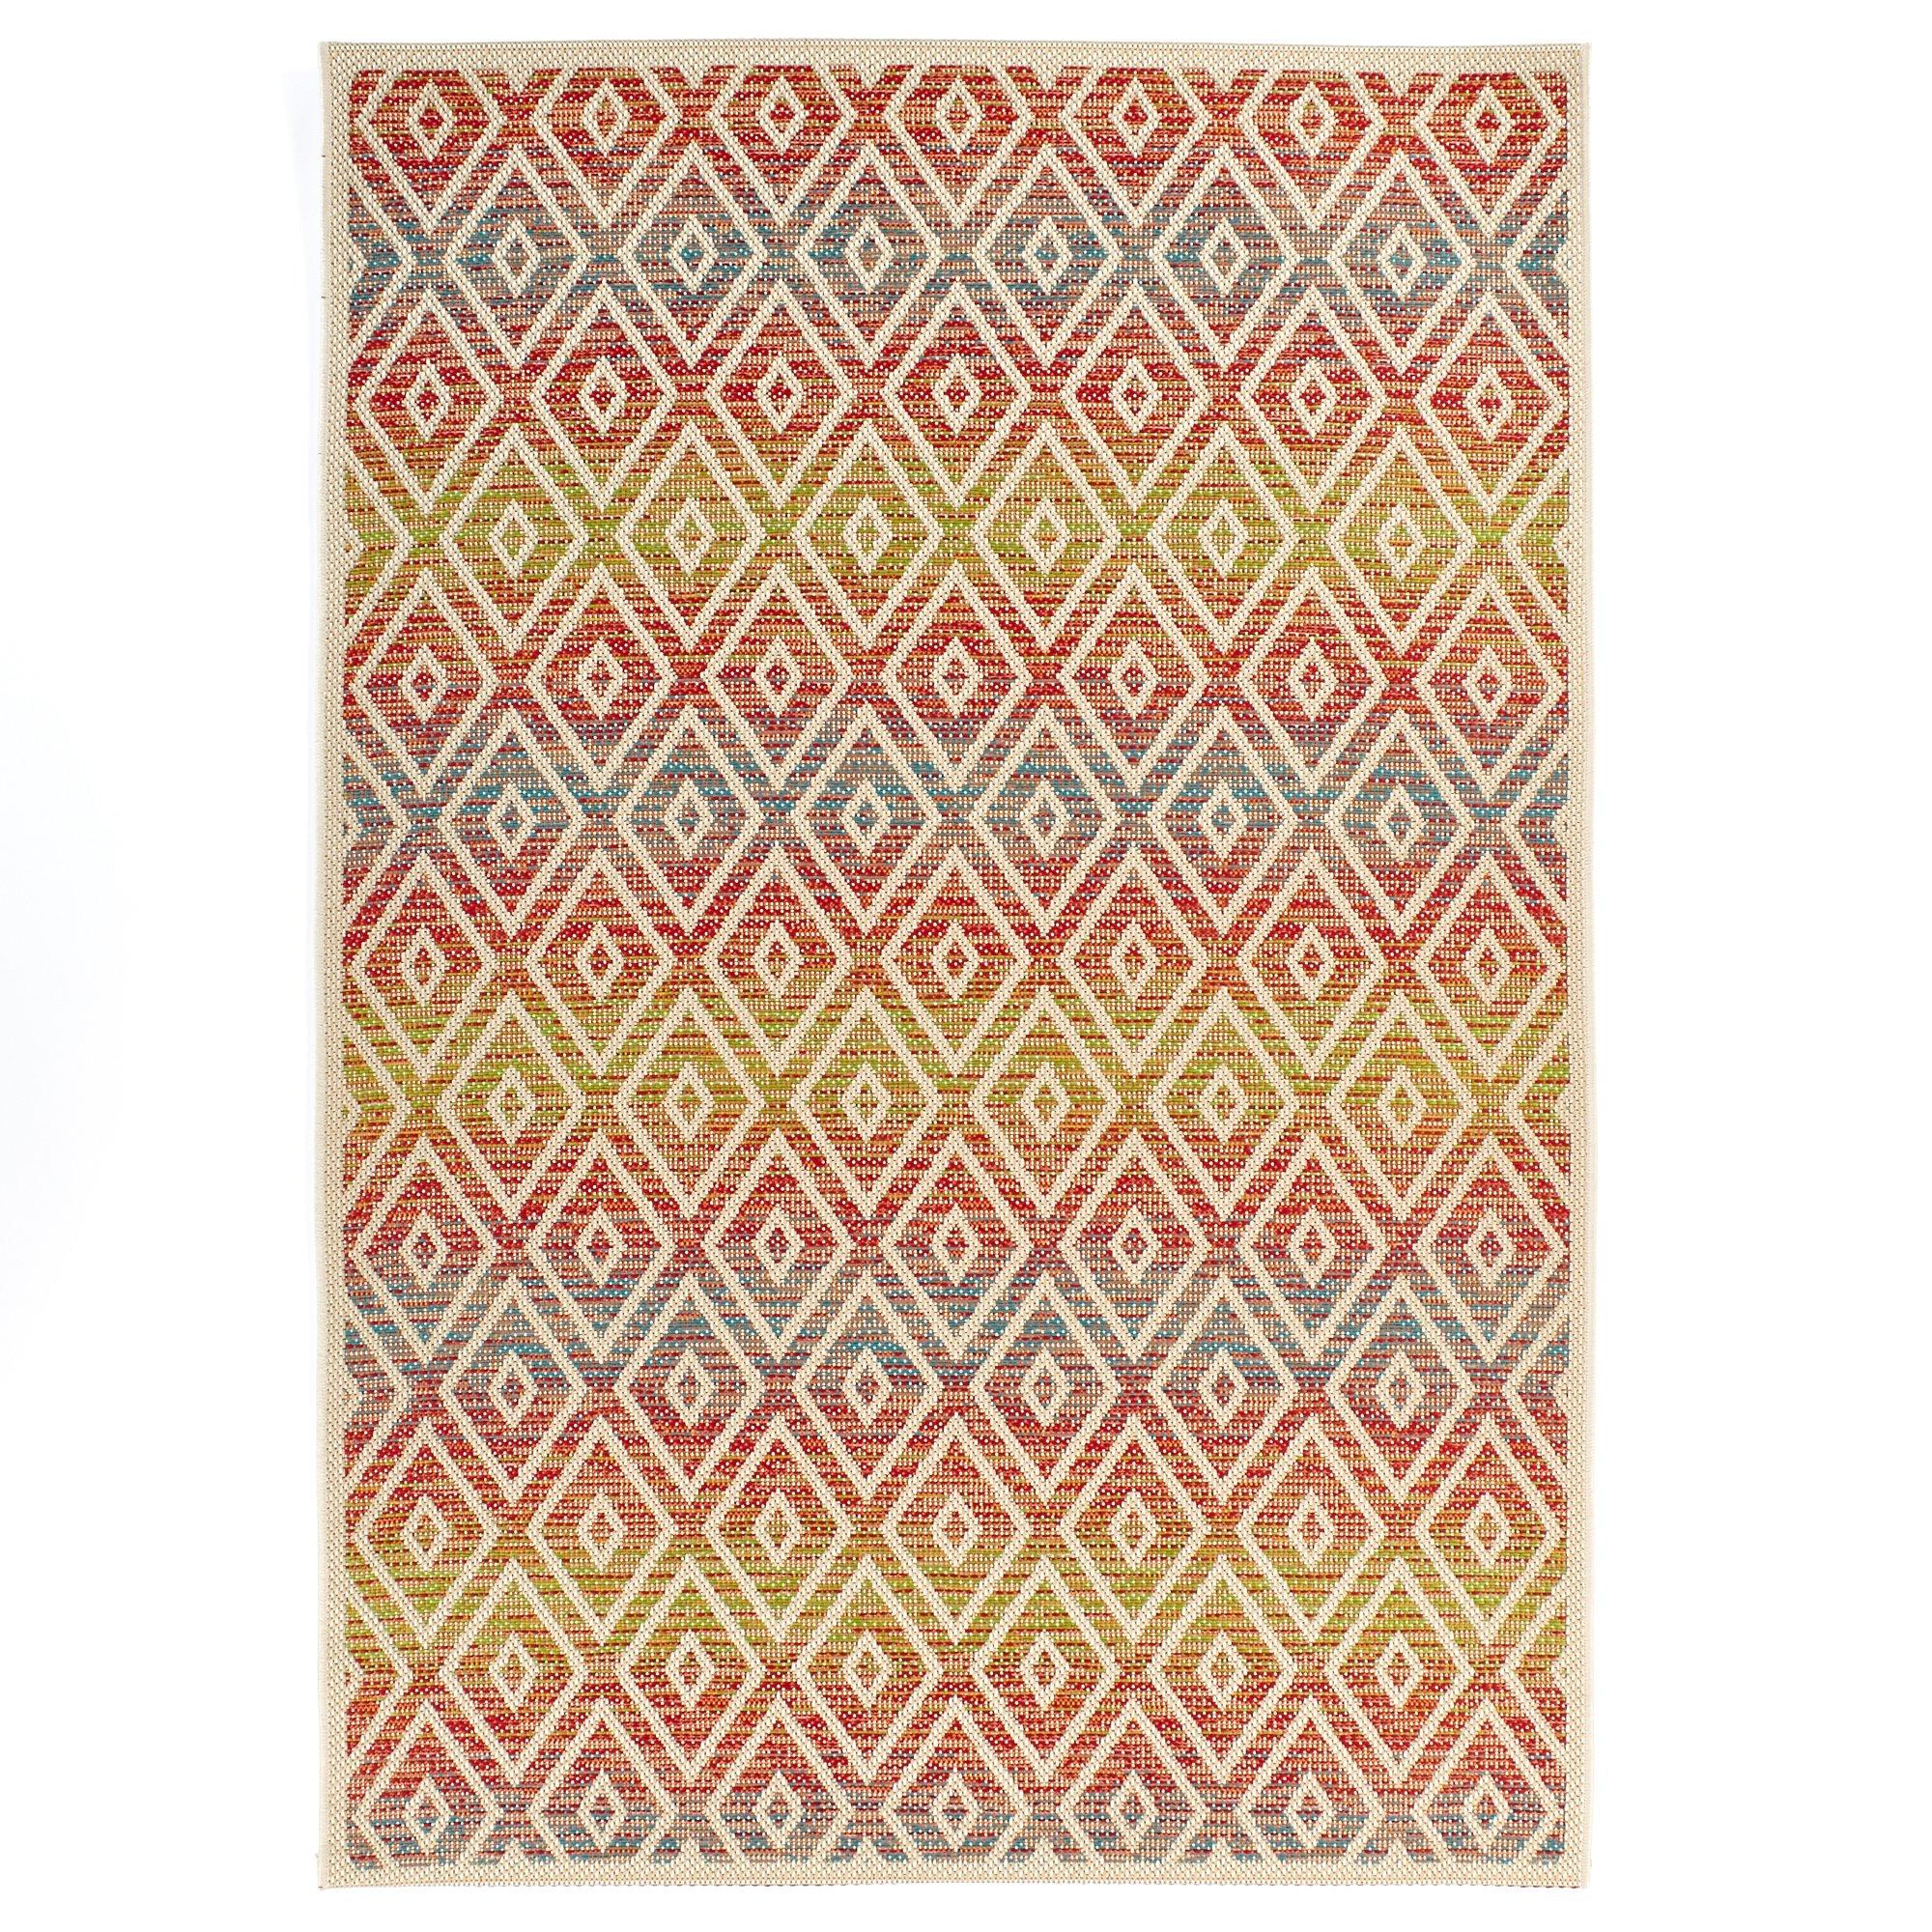 Carpet Art Deco Bellaire Collection Indoor Outdoor Rug, 5'3'' x7'5, Red/Blue/Green